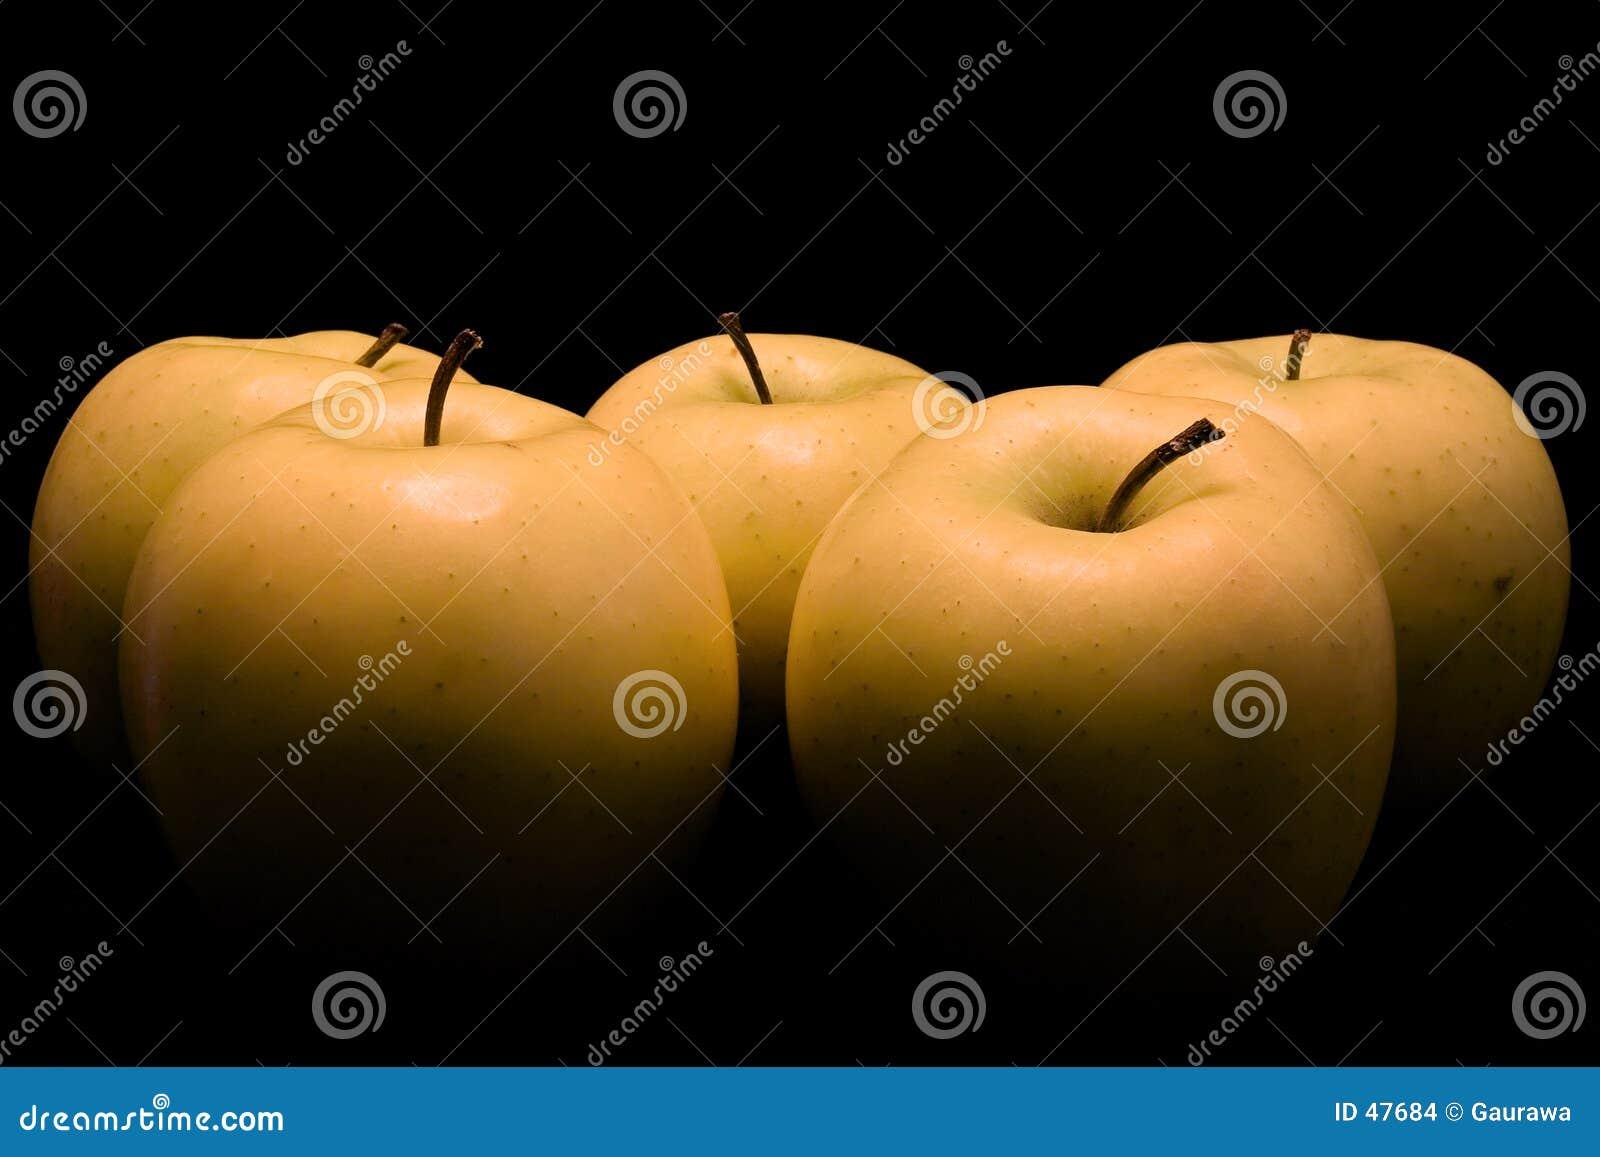 苹果点燃绘